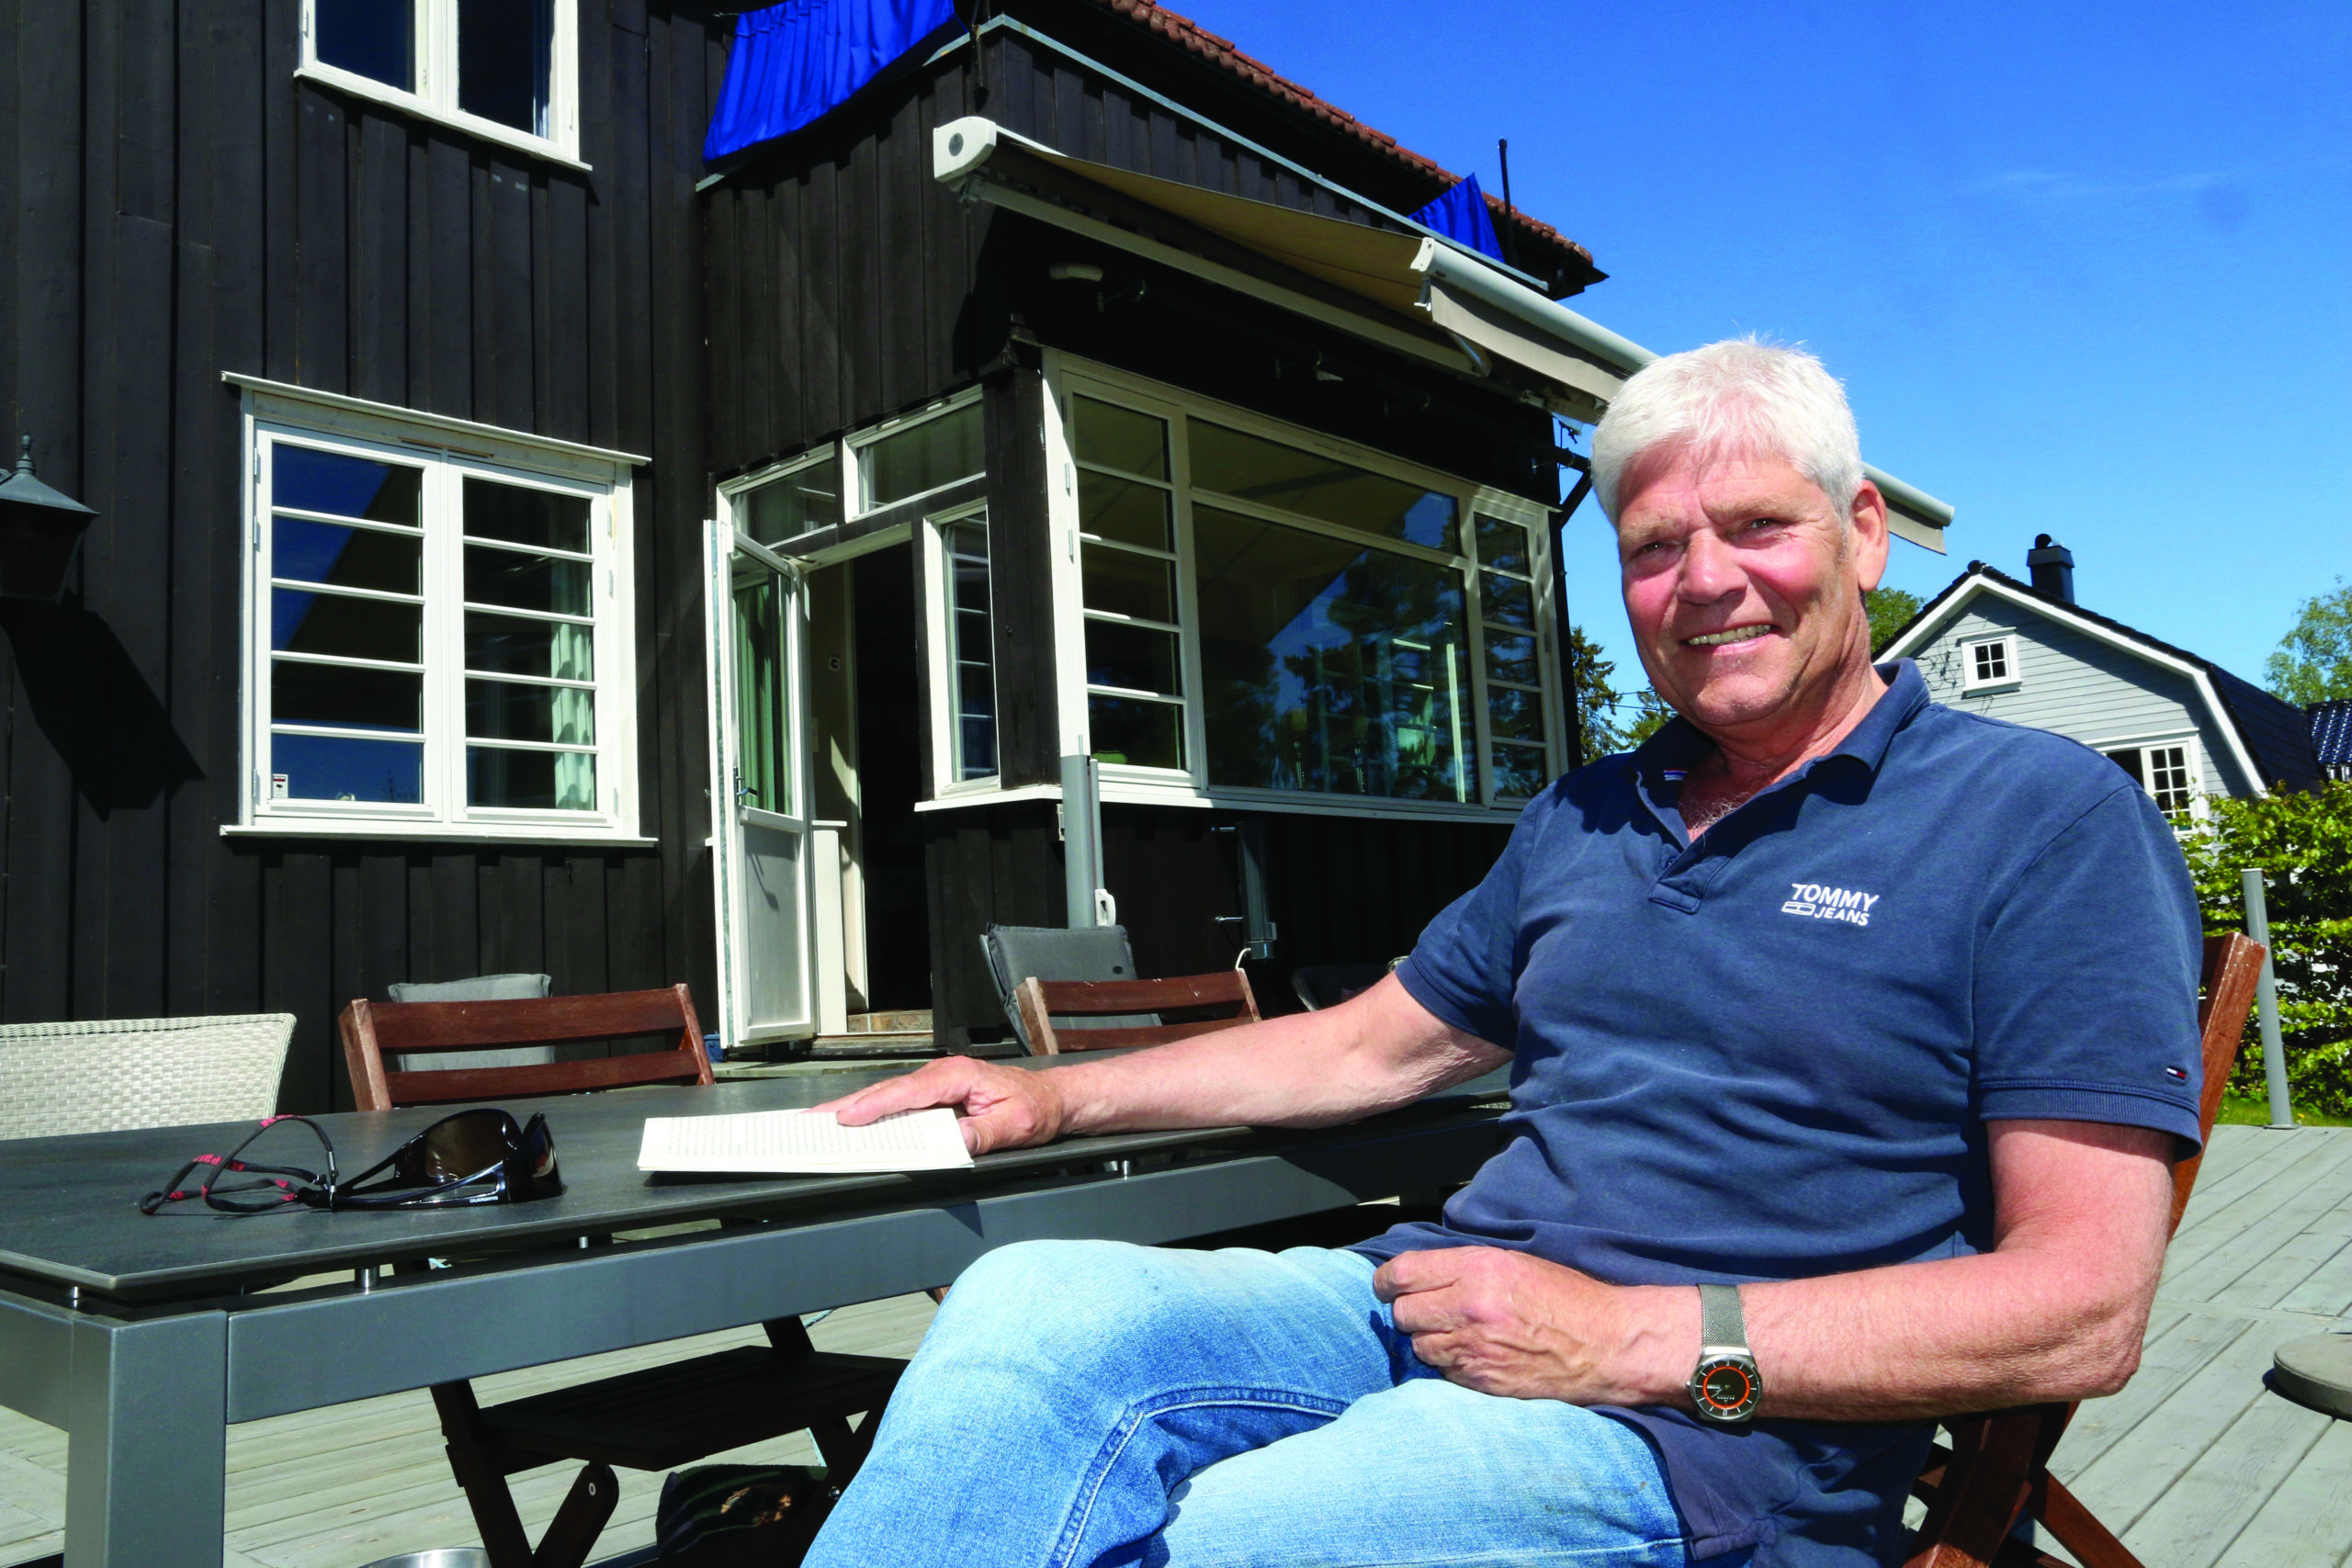 Thor-Erik Næss